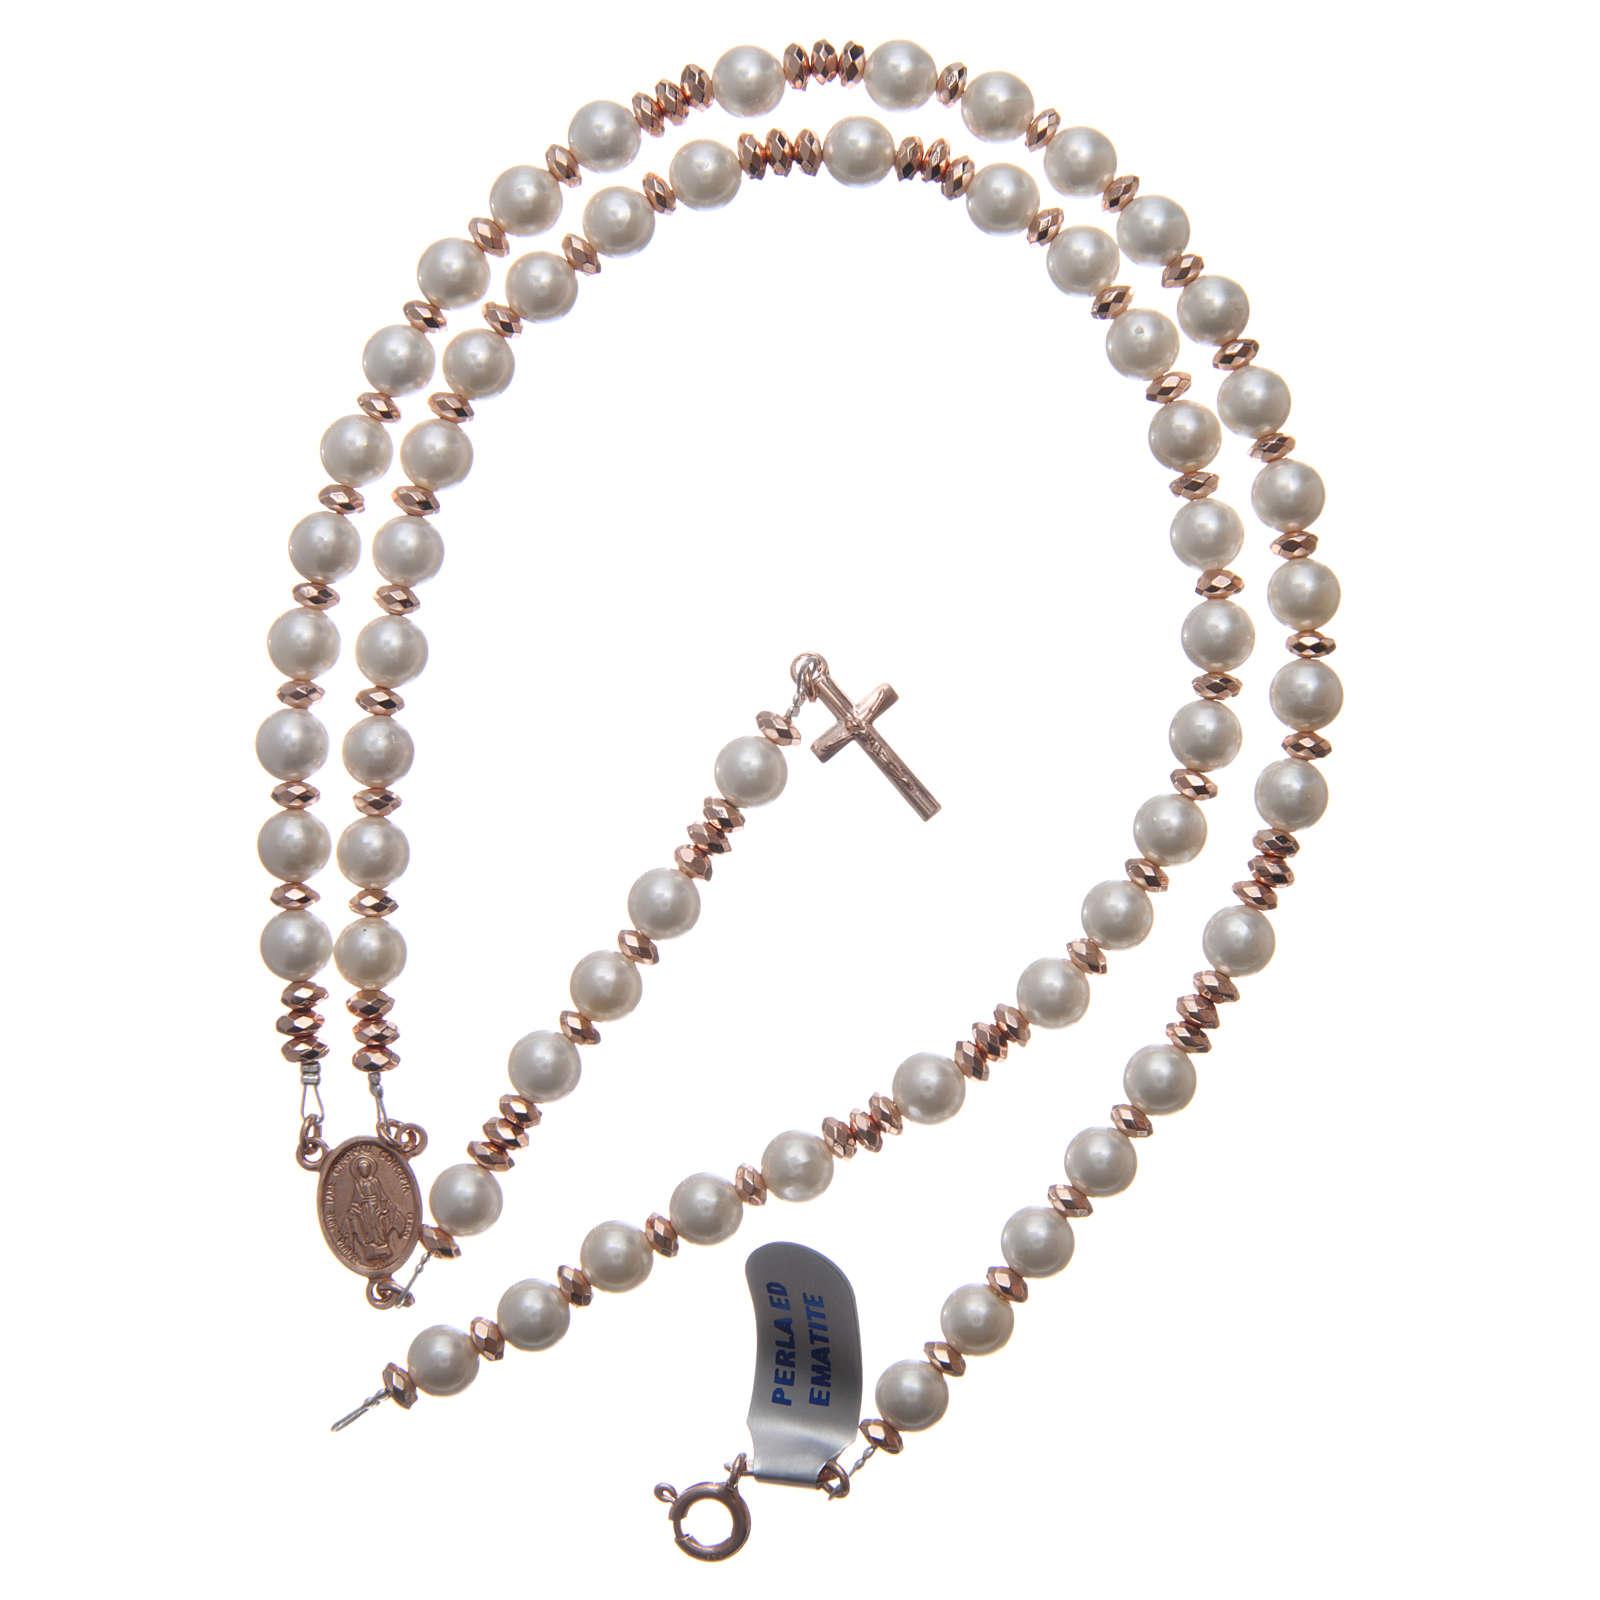 Rosario argento 925 cavetto pallina perla 6 mm rondelle ematite rosé sfaccettate 4